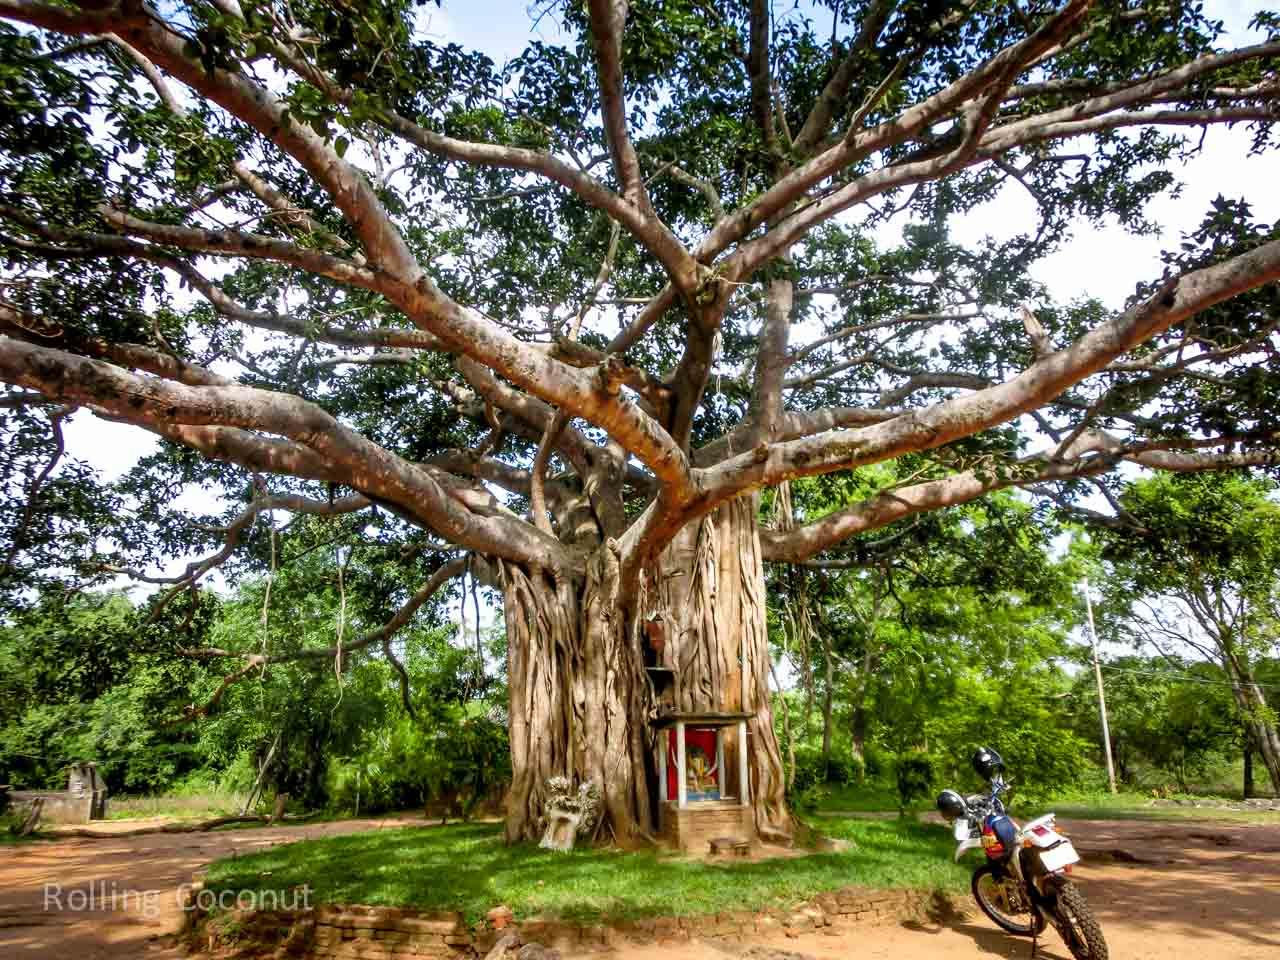 Sigiriya Sri Lanka itinerary Bodhi Tree ooaworld Rolling Coconut Photo Ooaworld